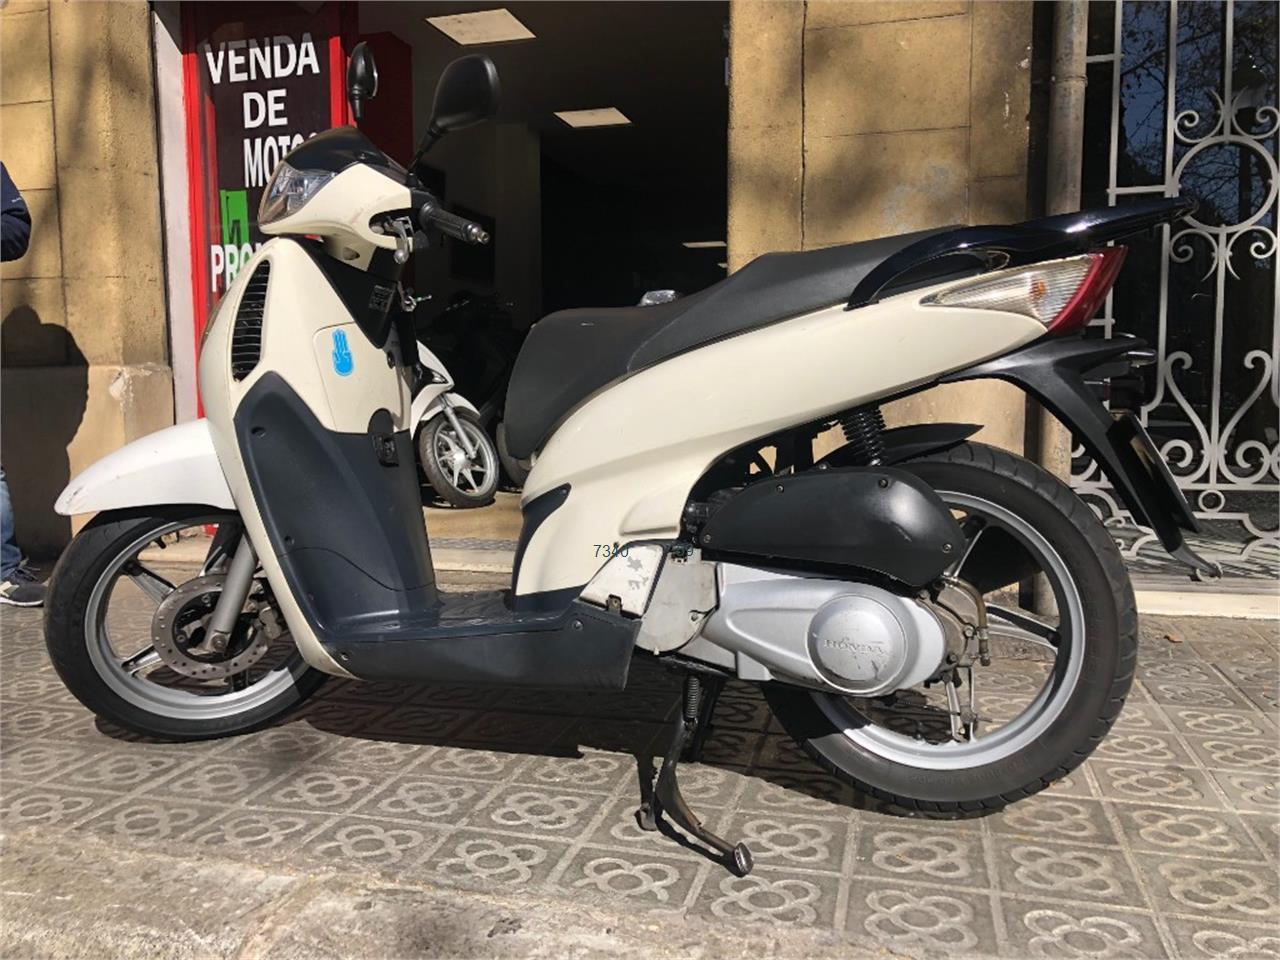 HONDA SCOOPY SH125i_4 de venta en Barcelona